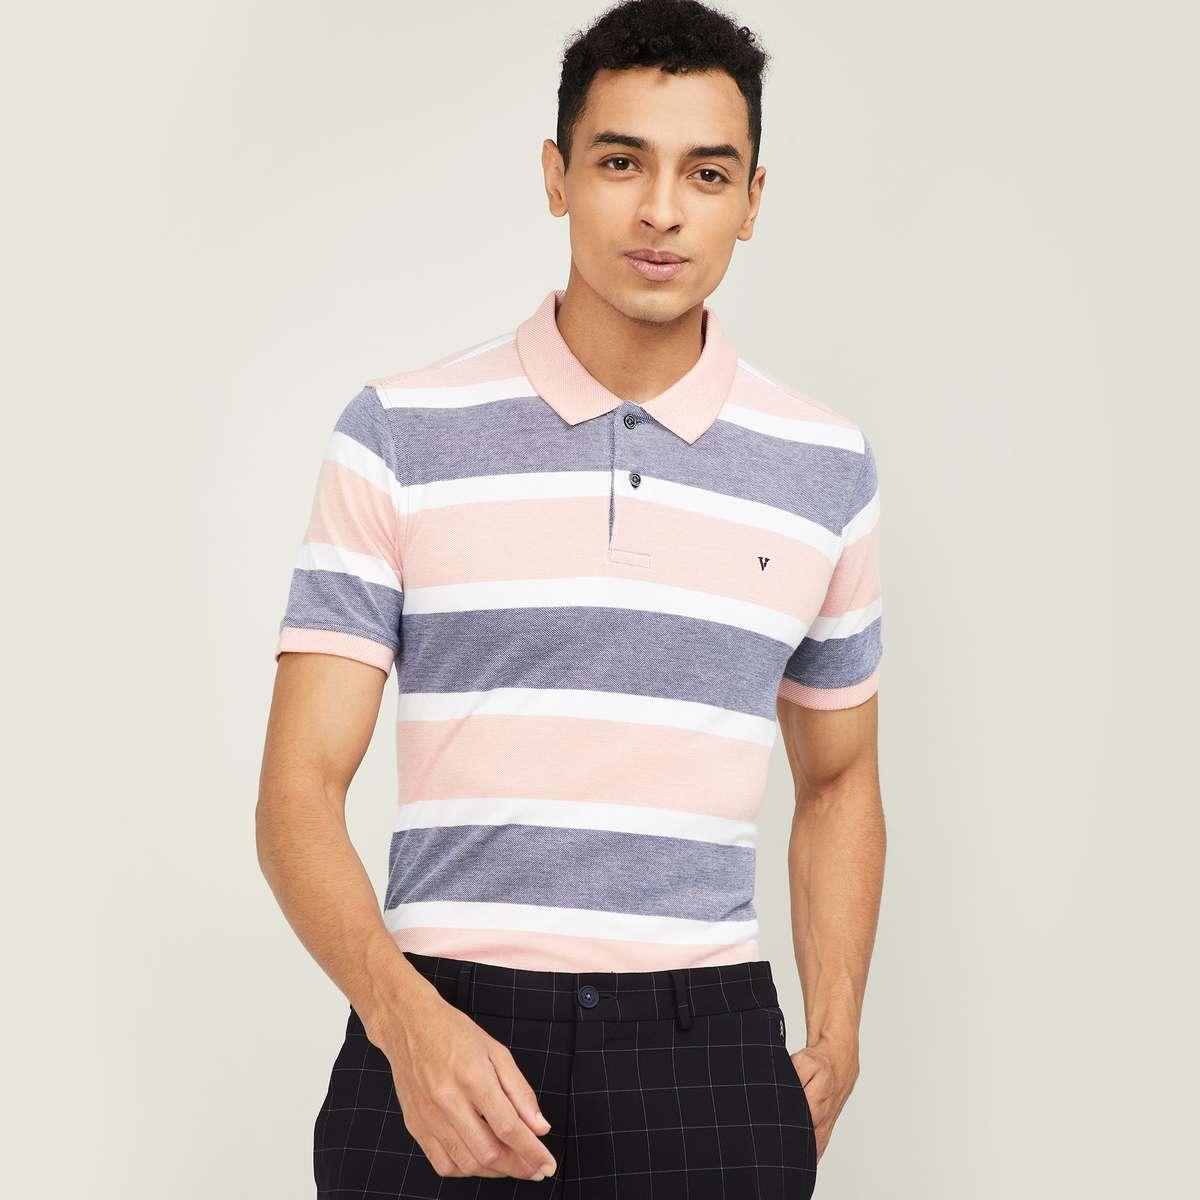 VH SPORTS Men Striped Short Sleeves Regular Fit Polo T-shirt